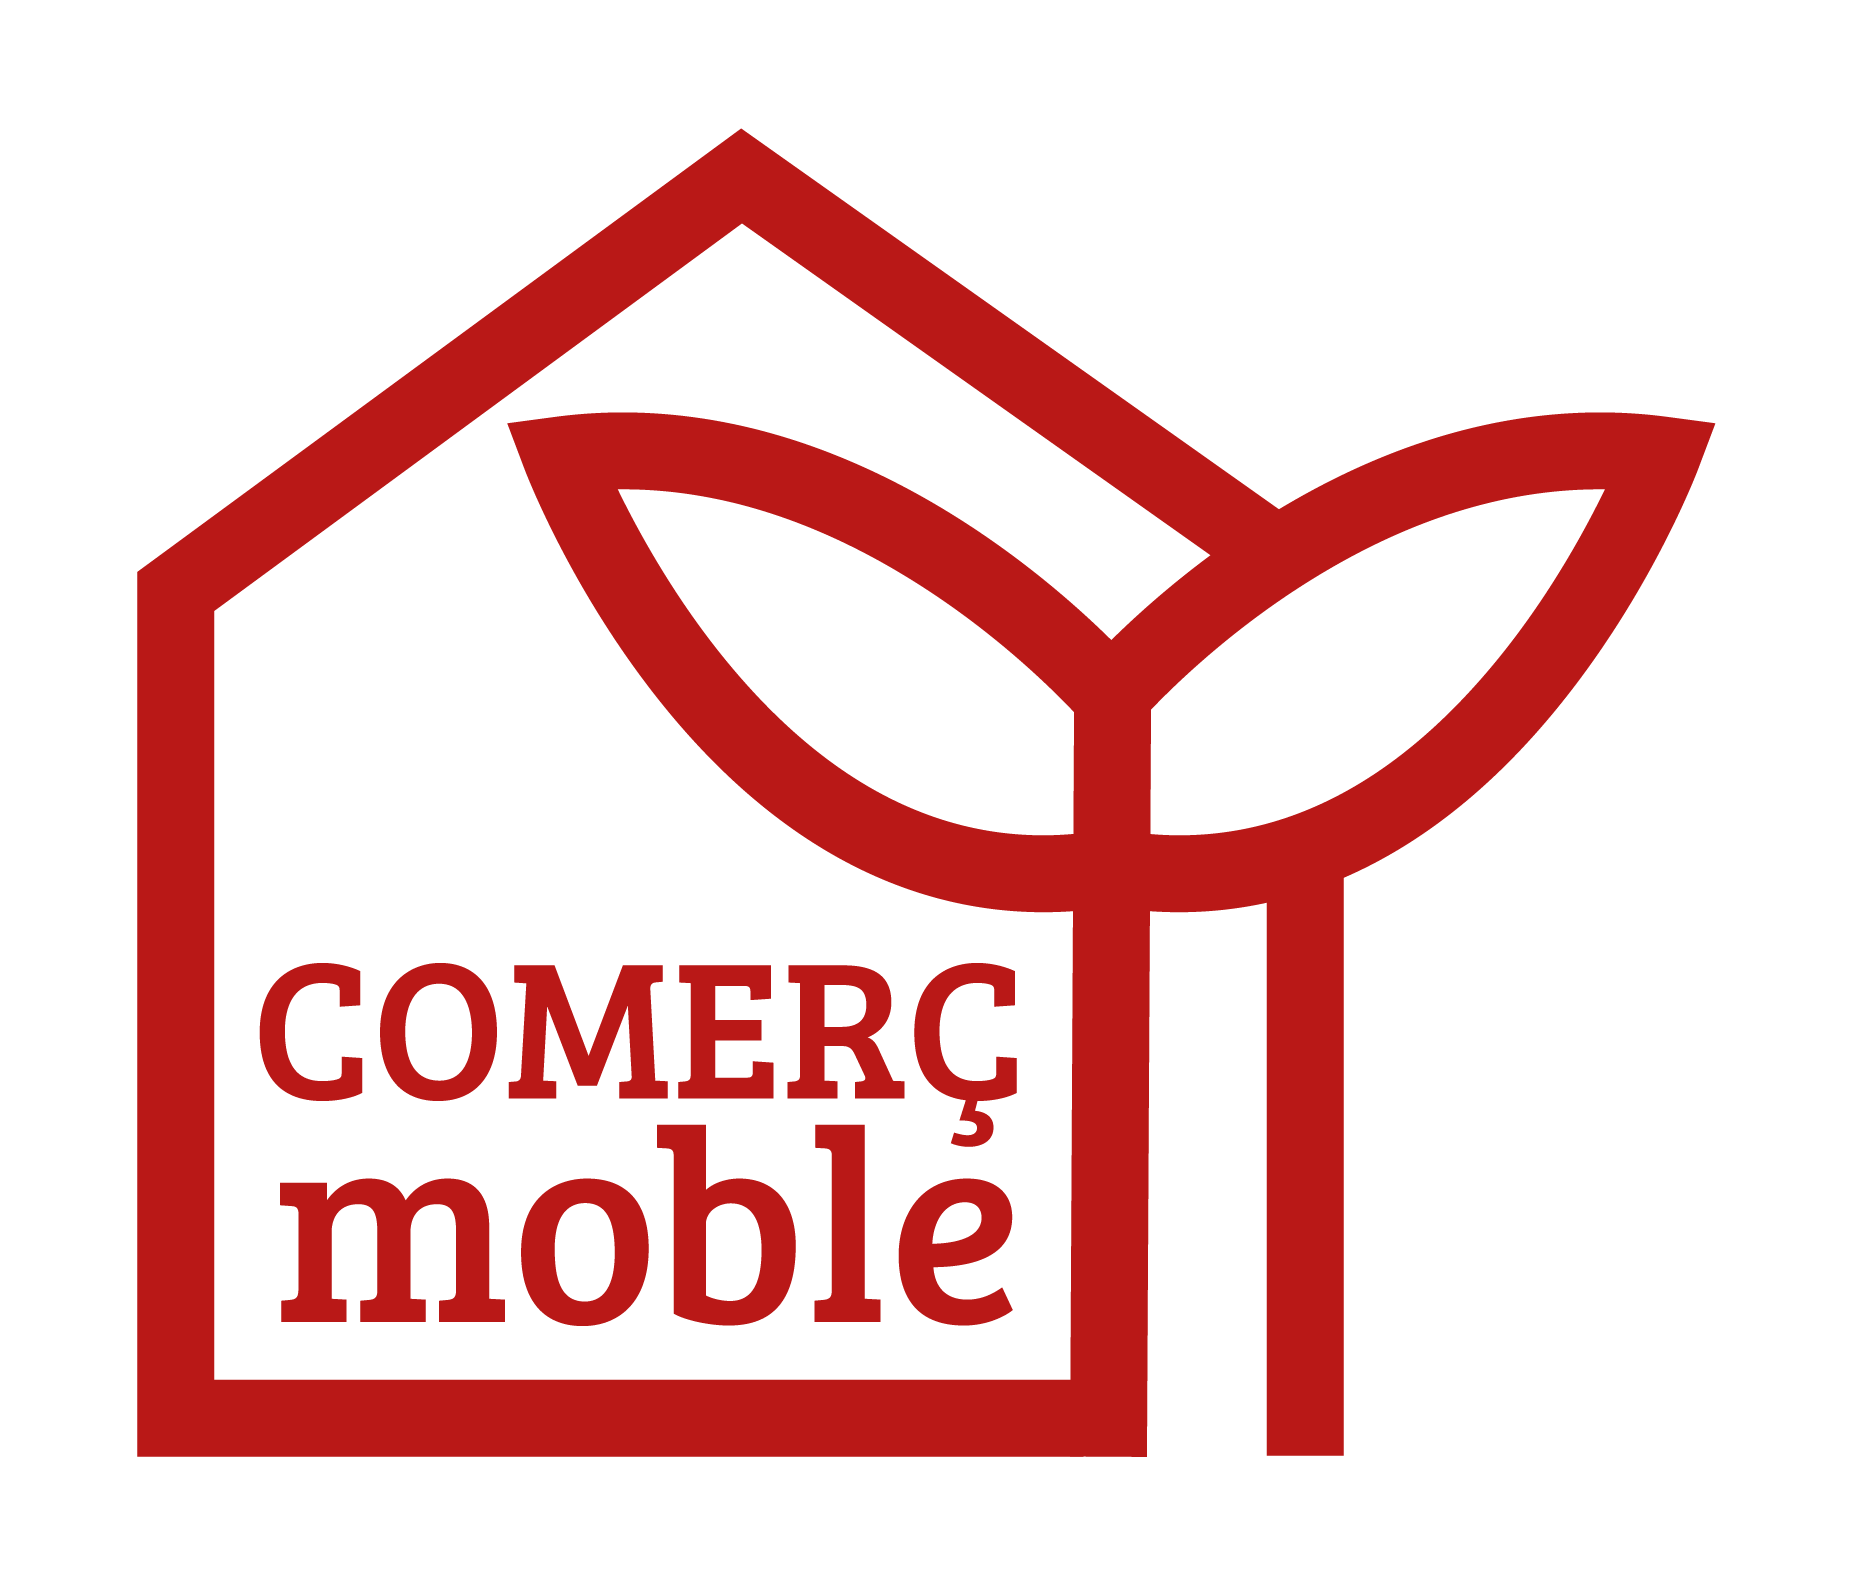 COMERÇ MOBLE-01